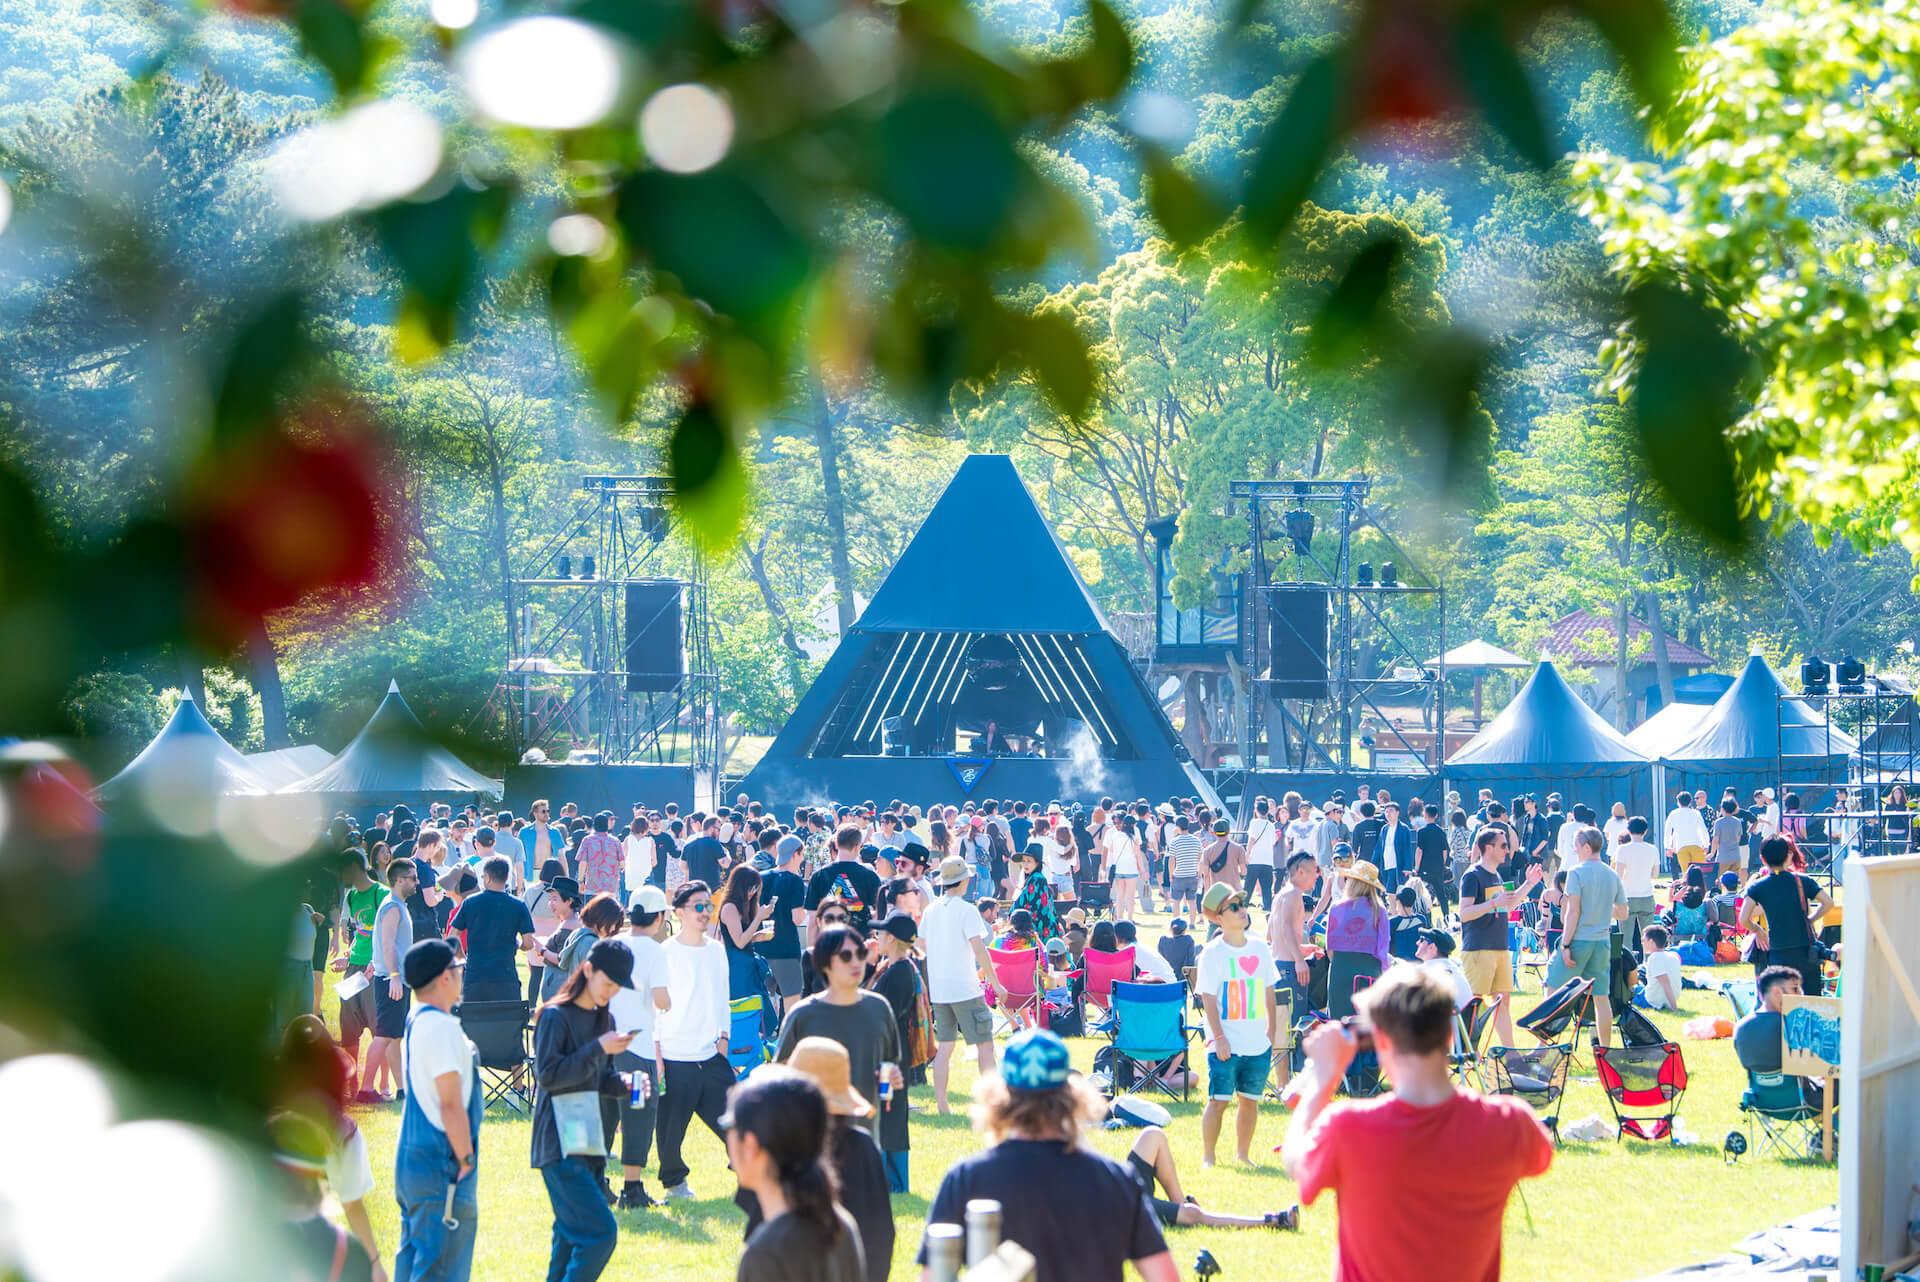 <RAINBOW DISCO CLUB>が初の野外オールナイト&7年ぶり都市型パーティーに!DJ Nobu、Wata Igarashi、Licaxxx、Sauce81ら第1弾ラインナップ発表 music210318_rdc2021_6